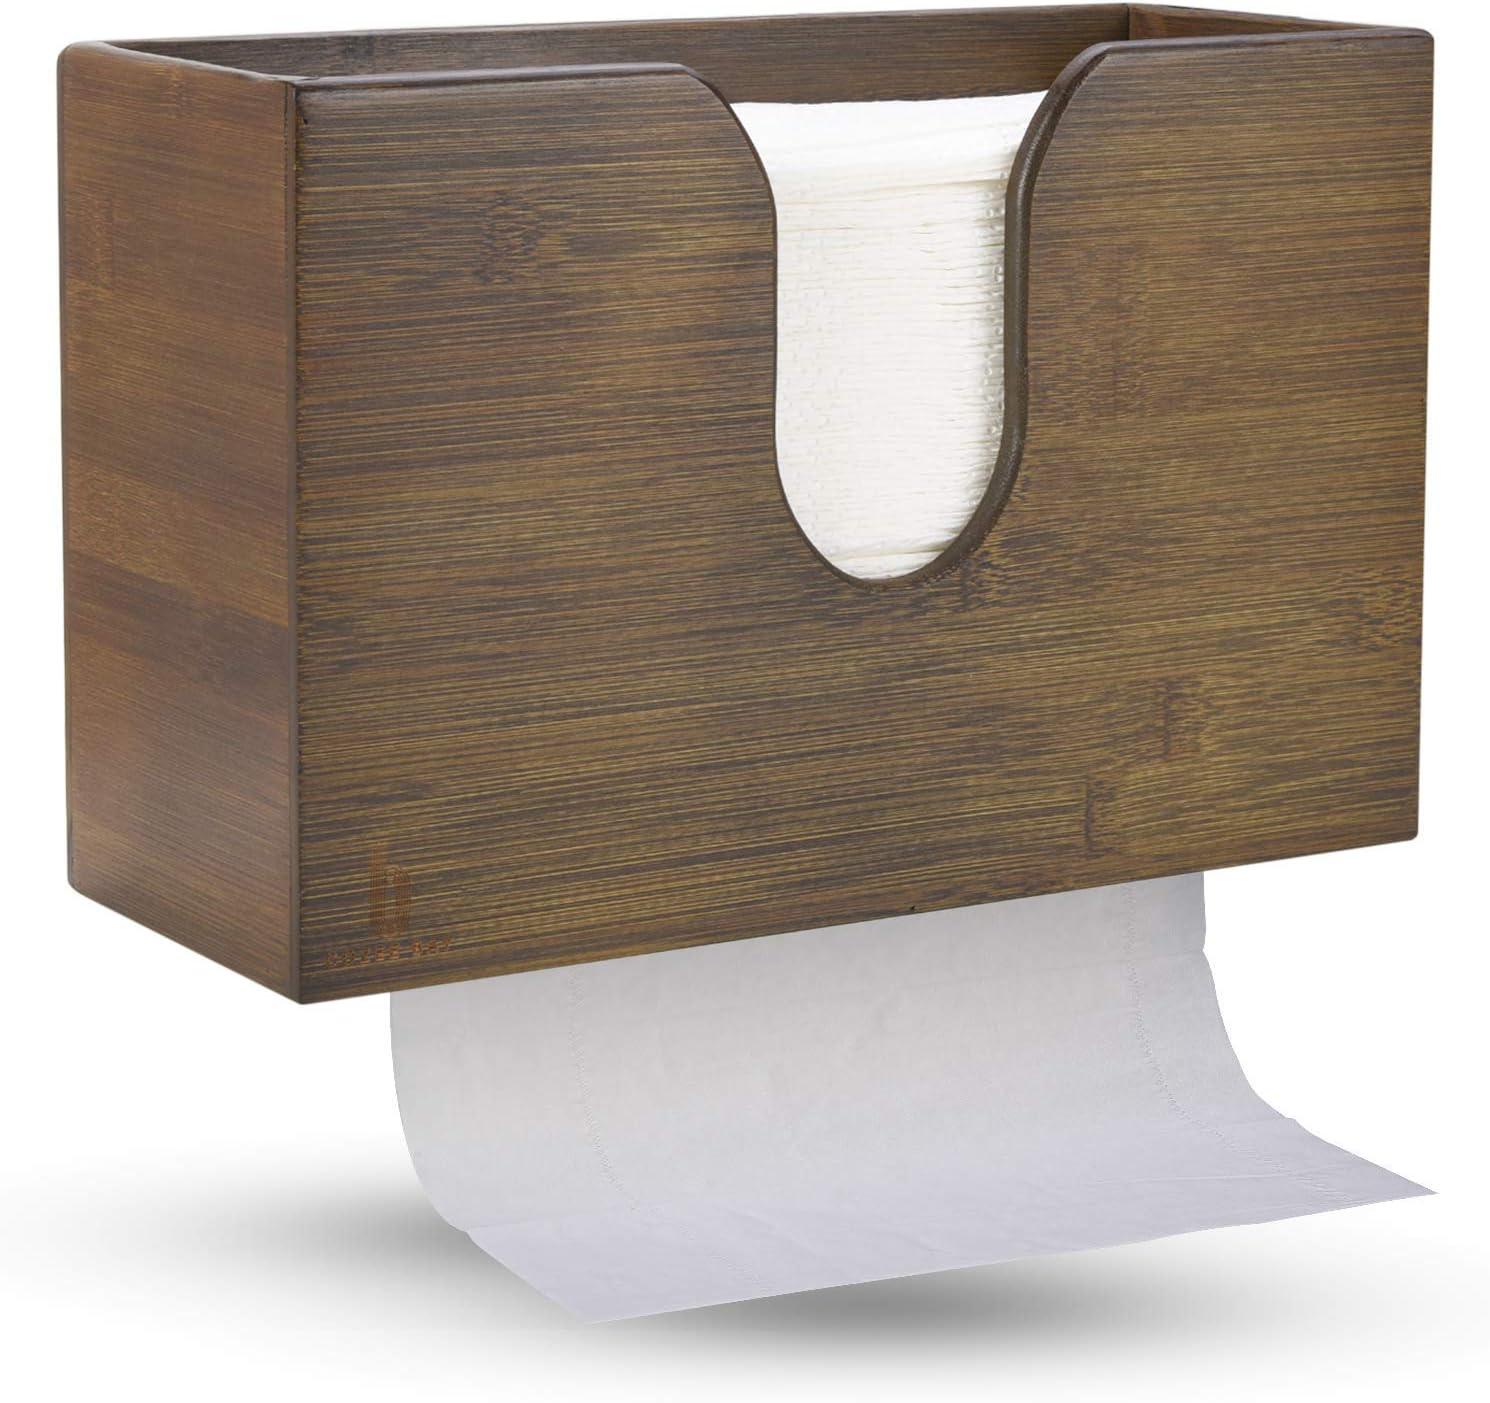 Bamboo Paper Towel Dispenser, Paper Hand Towel Holder For Bathroom